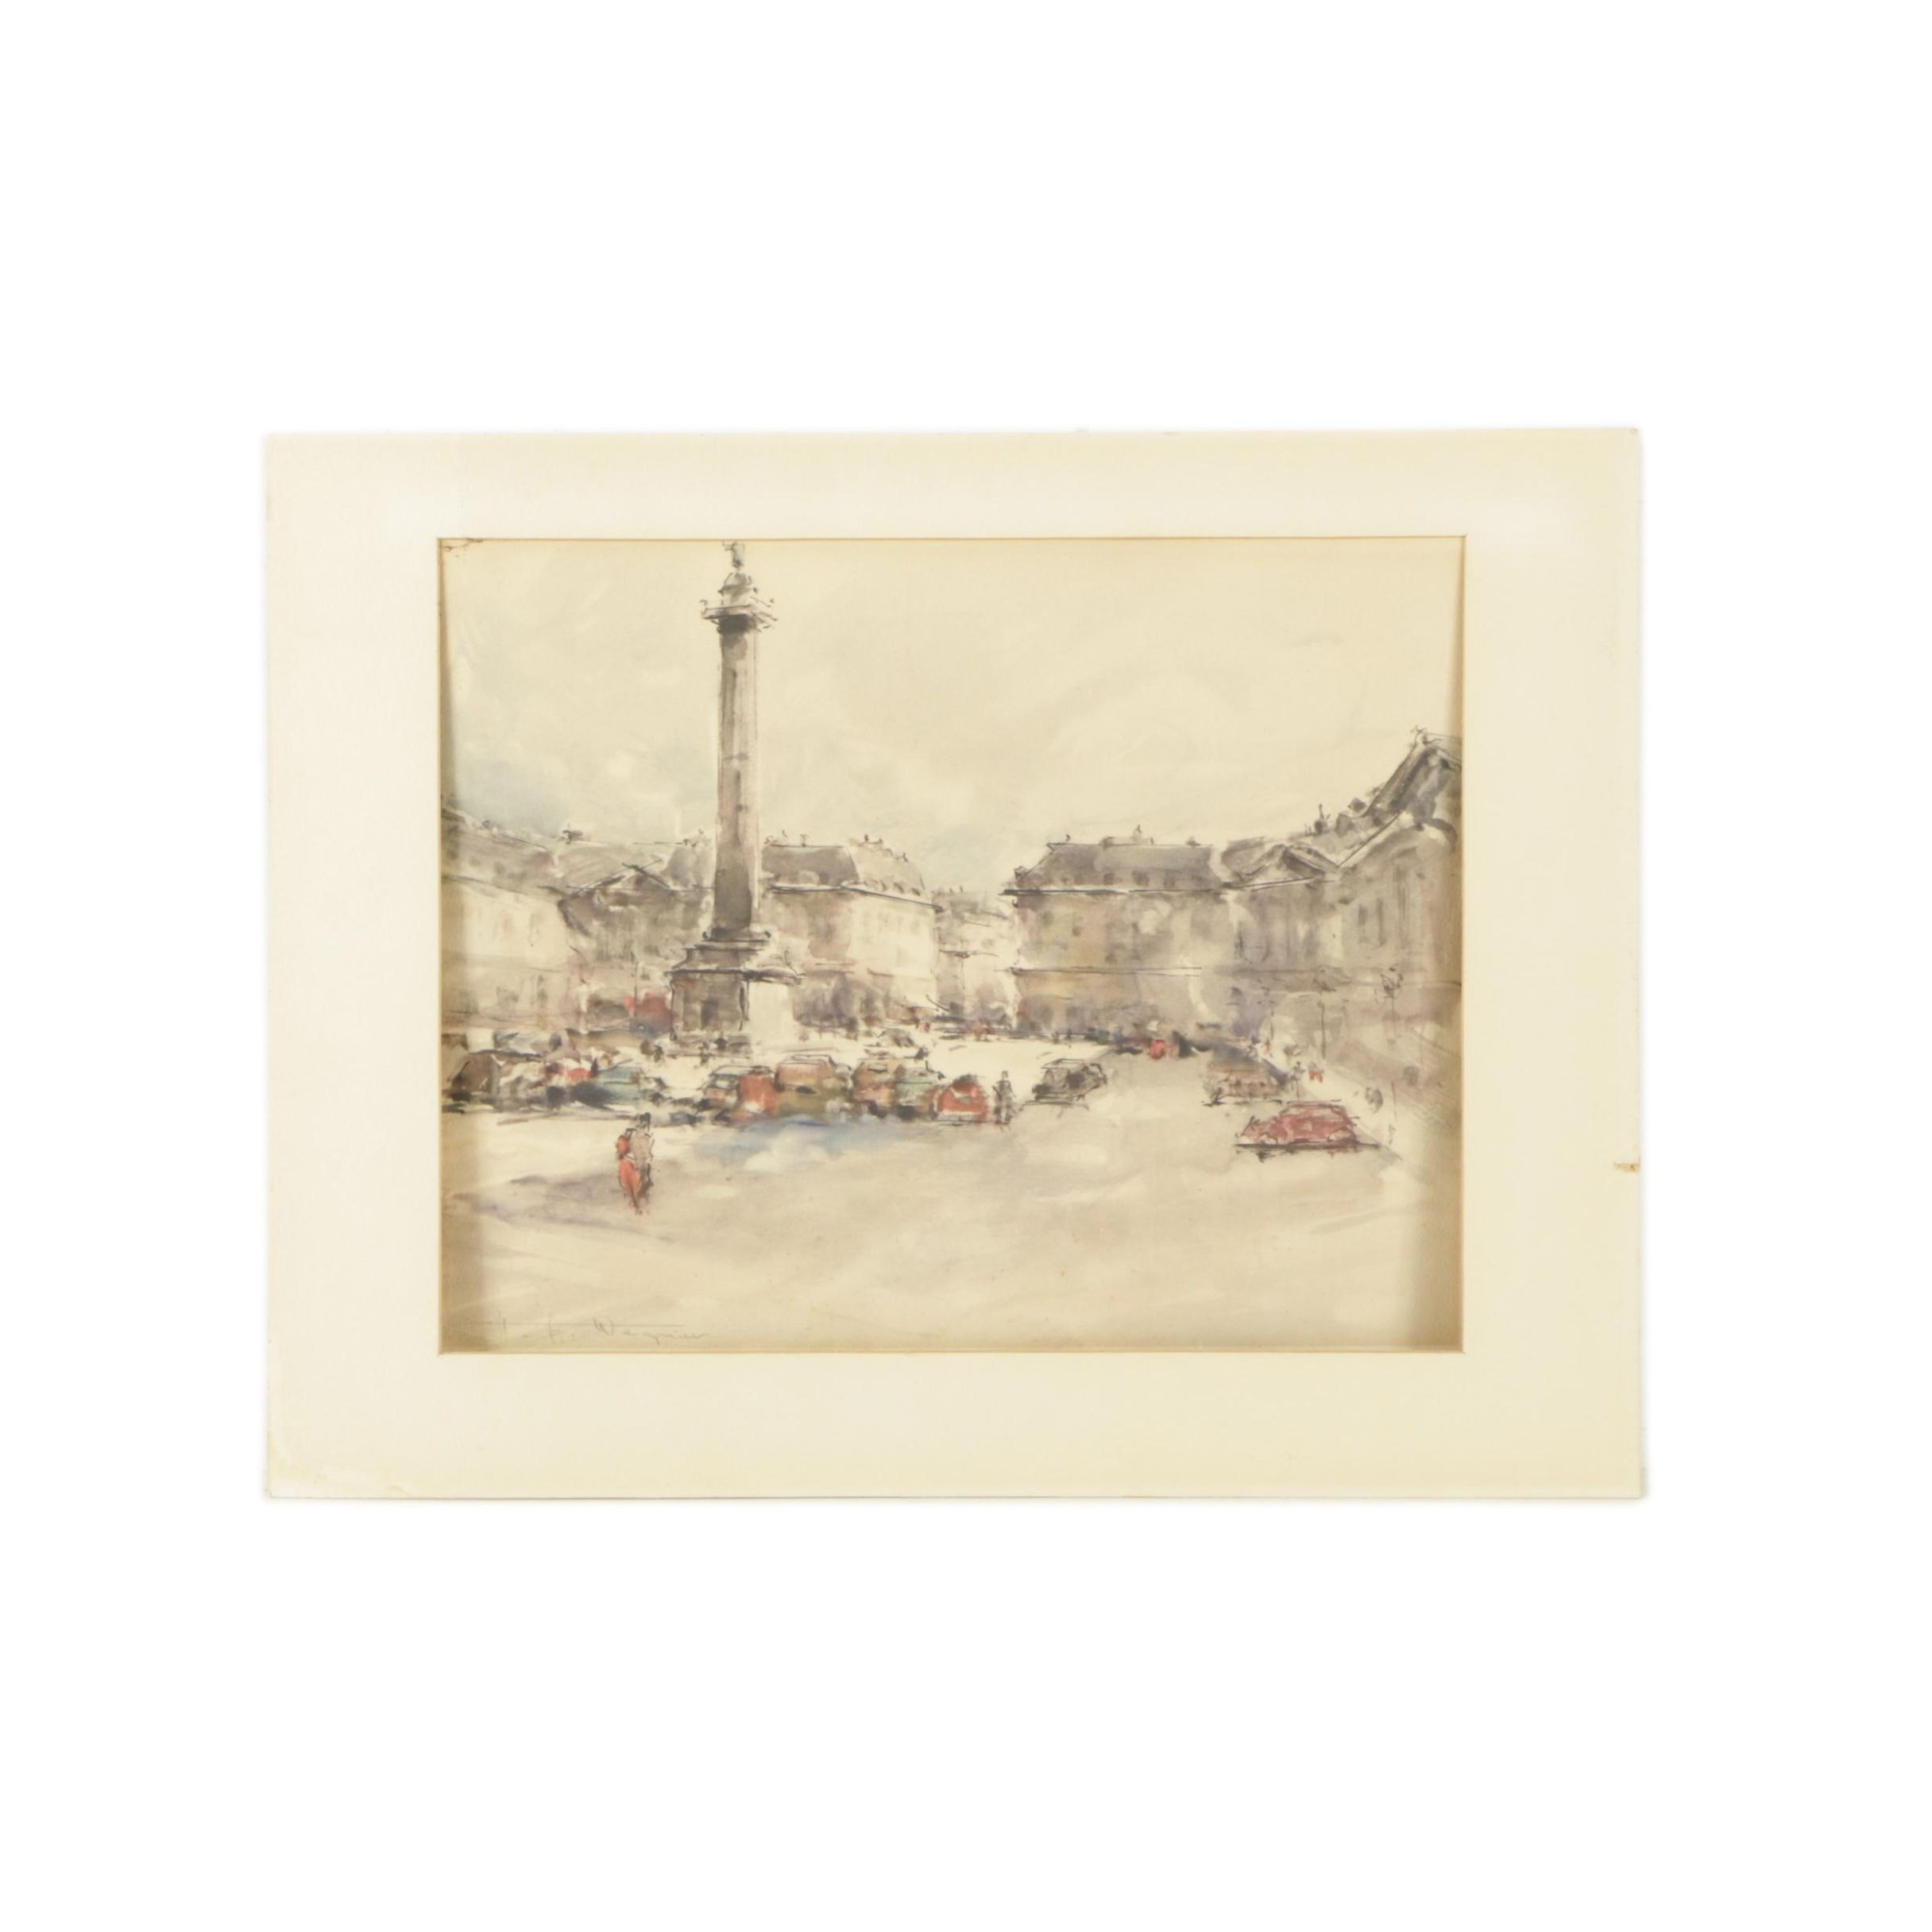 Offset Lithograph on Paper of Place Vendôme